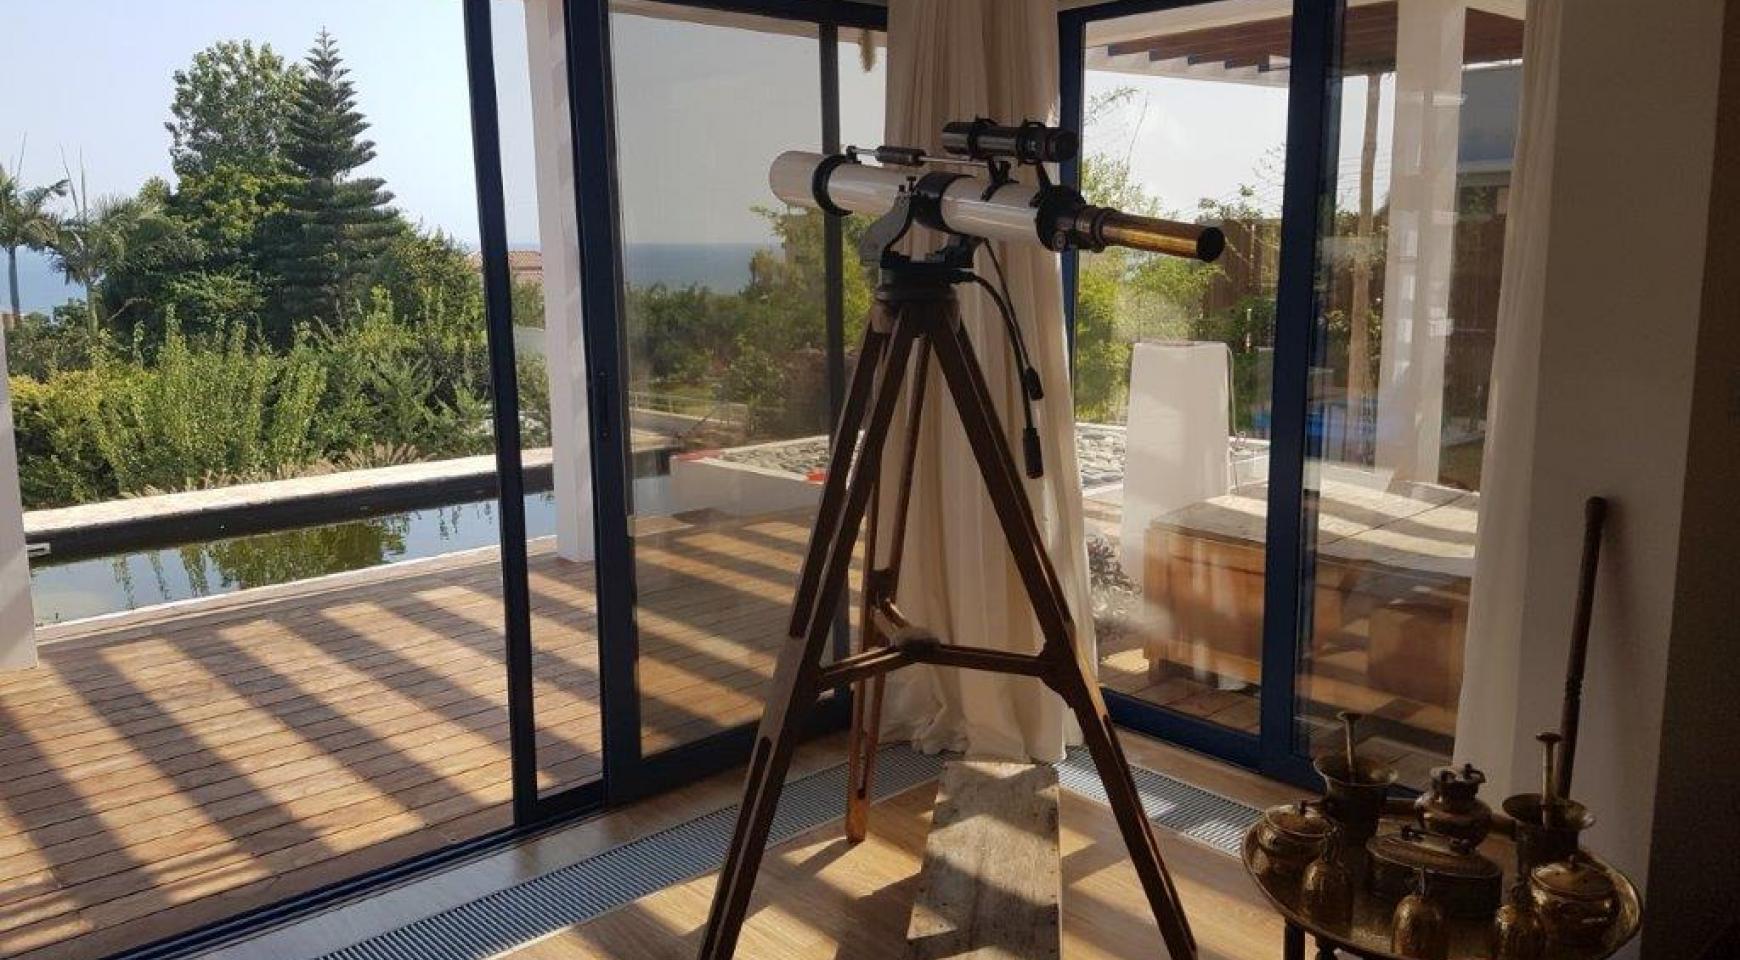 5-Спальная Вилла с видом на Море в районе  Agios Tychonas - 13